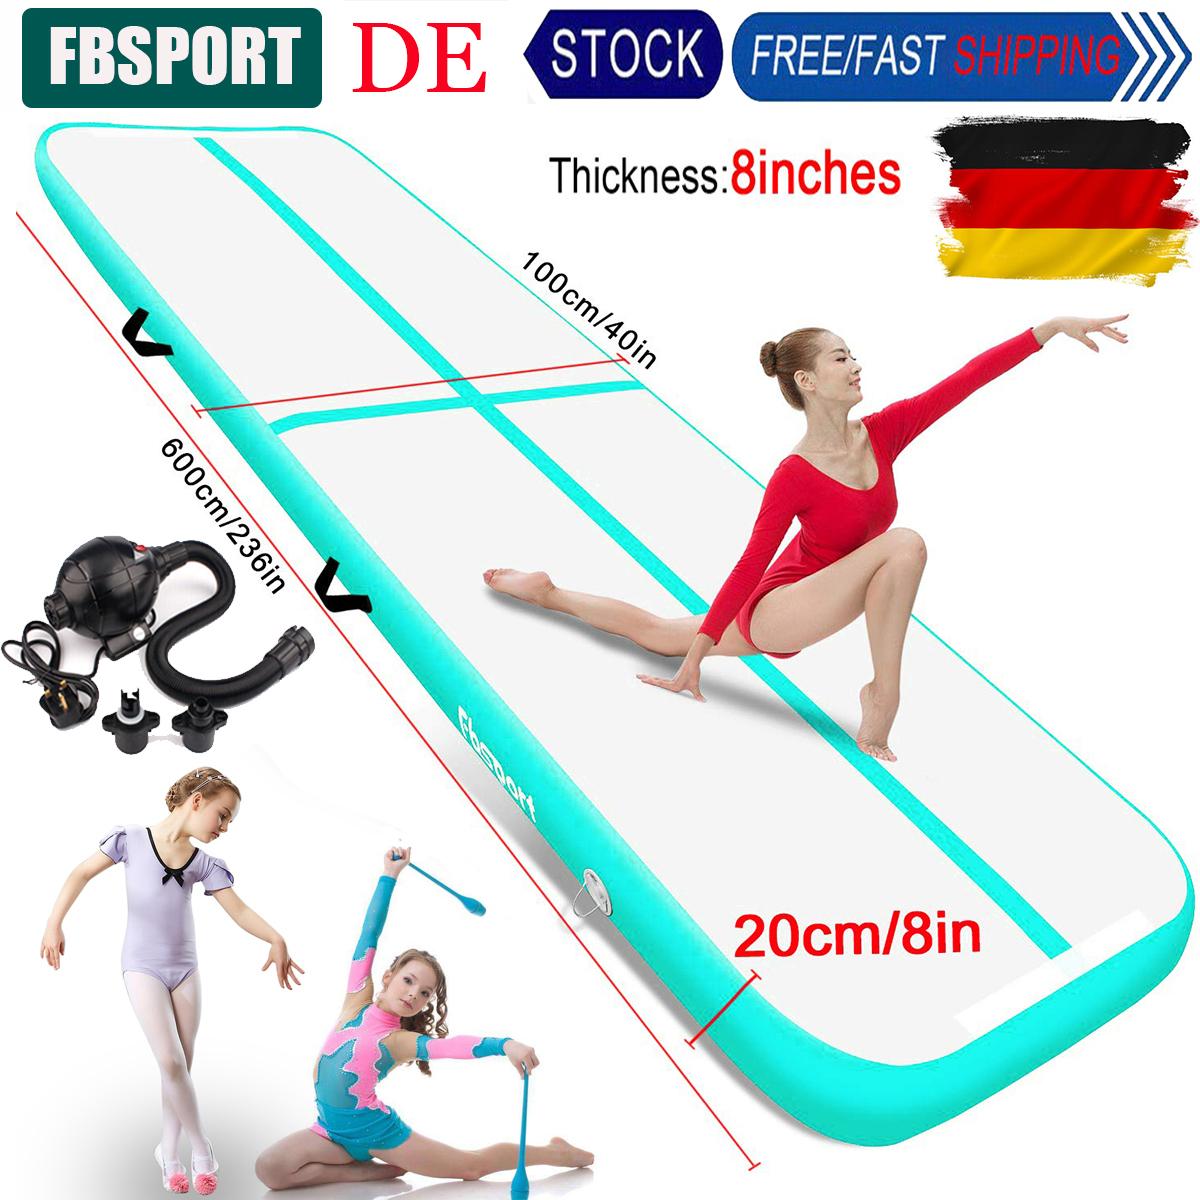 20cm Dick Air Track 6m 7m 8m da ginnastica tappetino Tumbling tappetino tappetino Turn con pompa